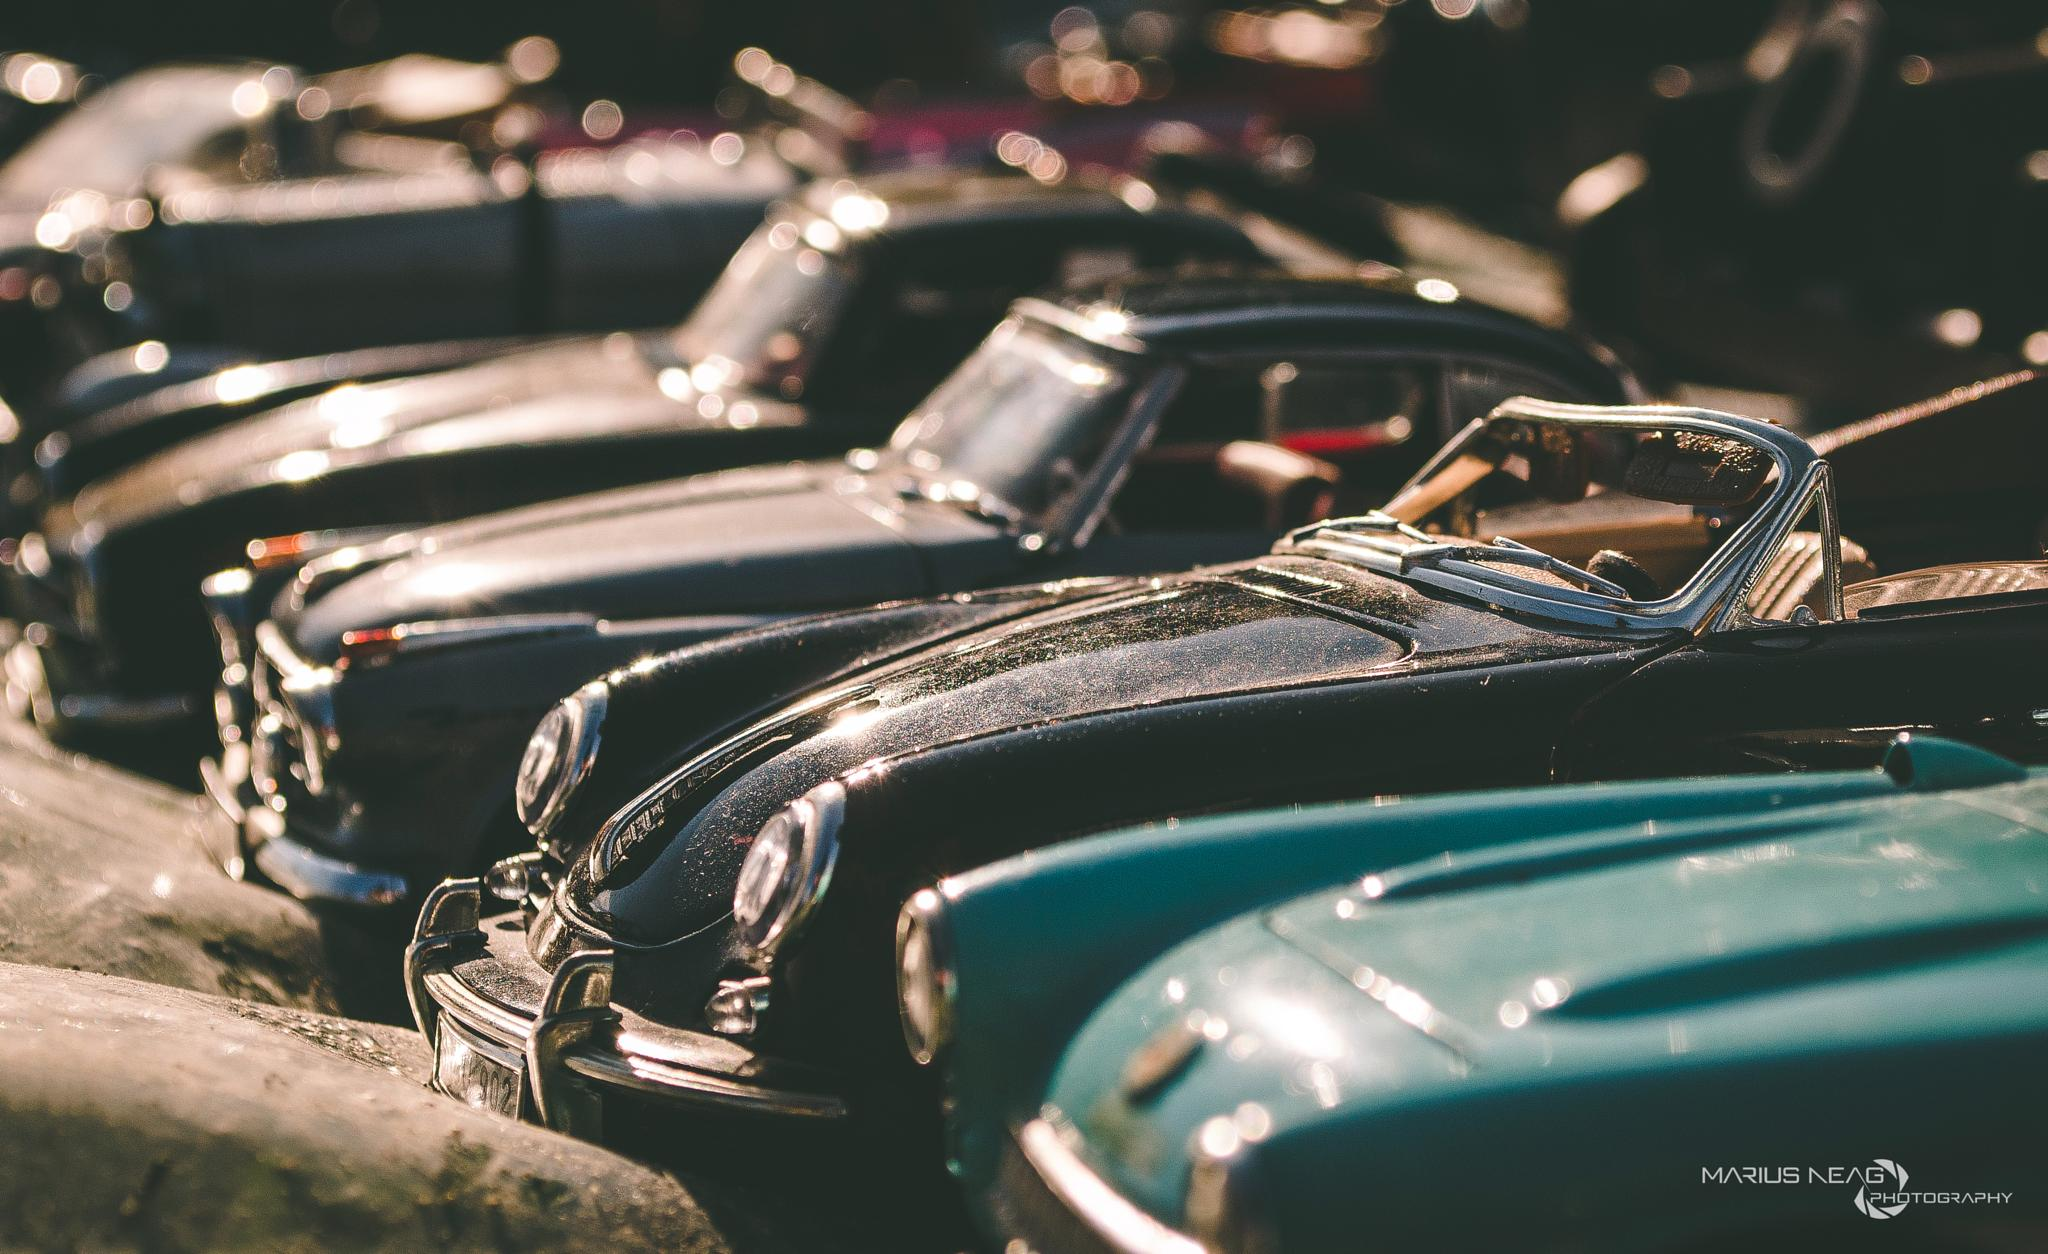 Tiny cars by Marius Neag